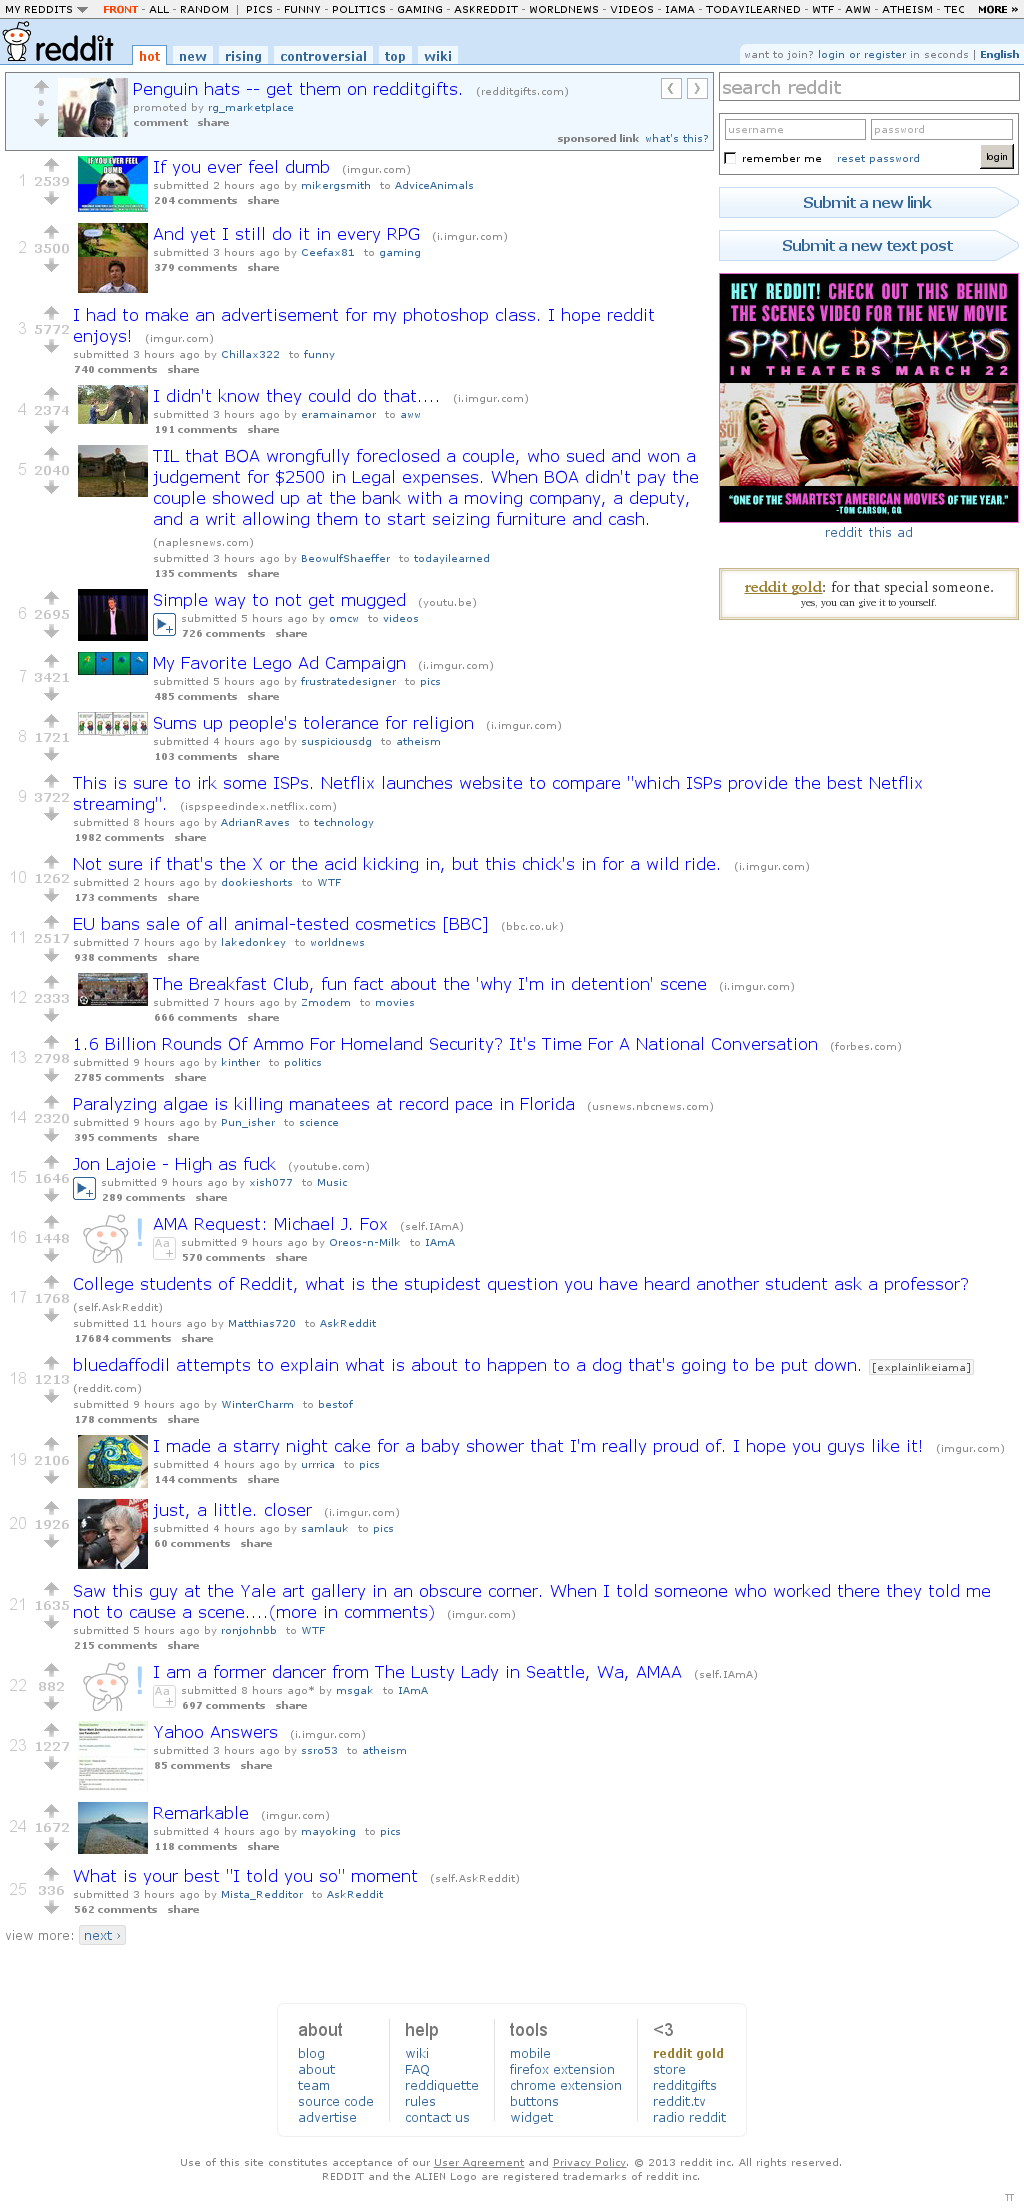 Reddit at Tuesday March 12, 2013, 1:19 a.m. UTC